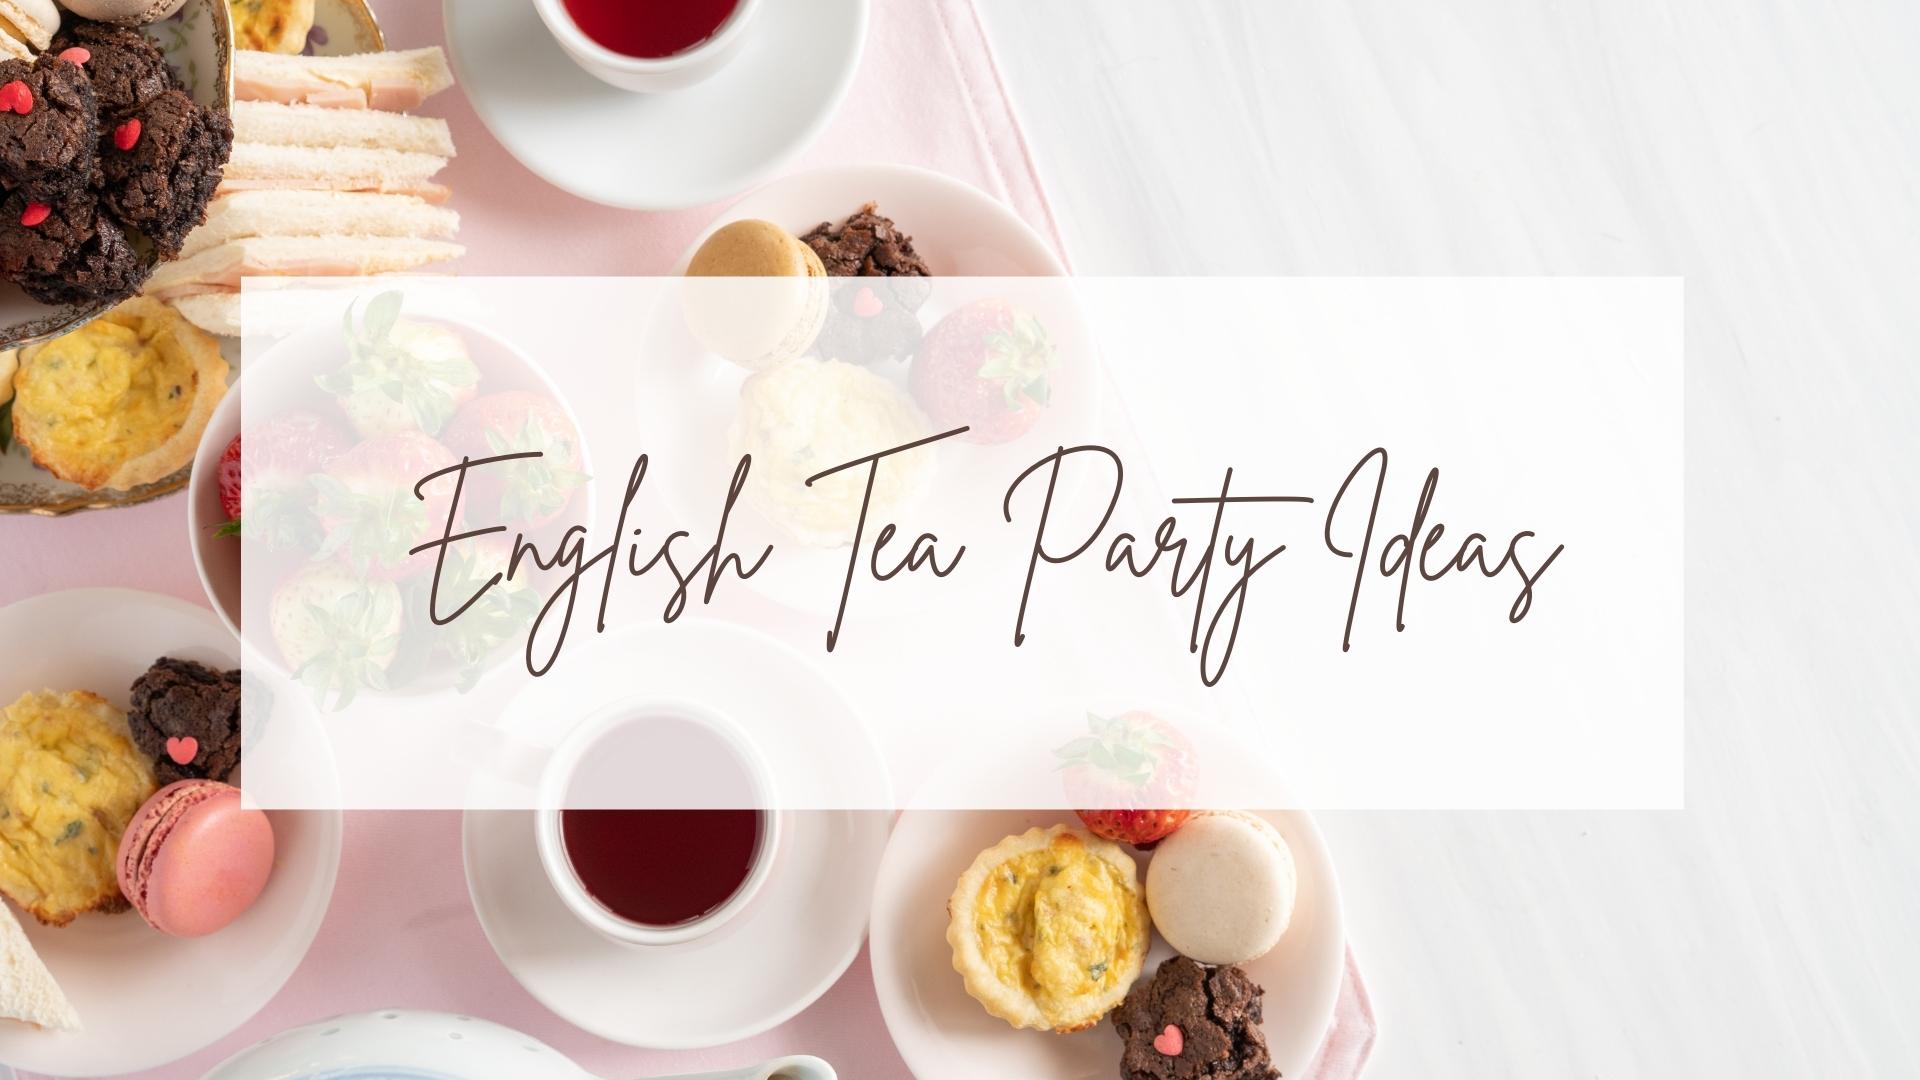 Tea Party Ideas | Hosting an English Tea Party | Peachy Interiors